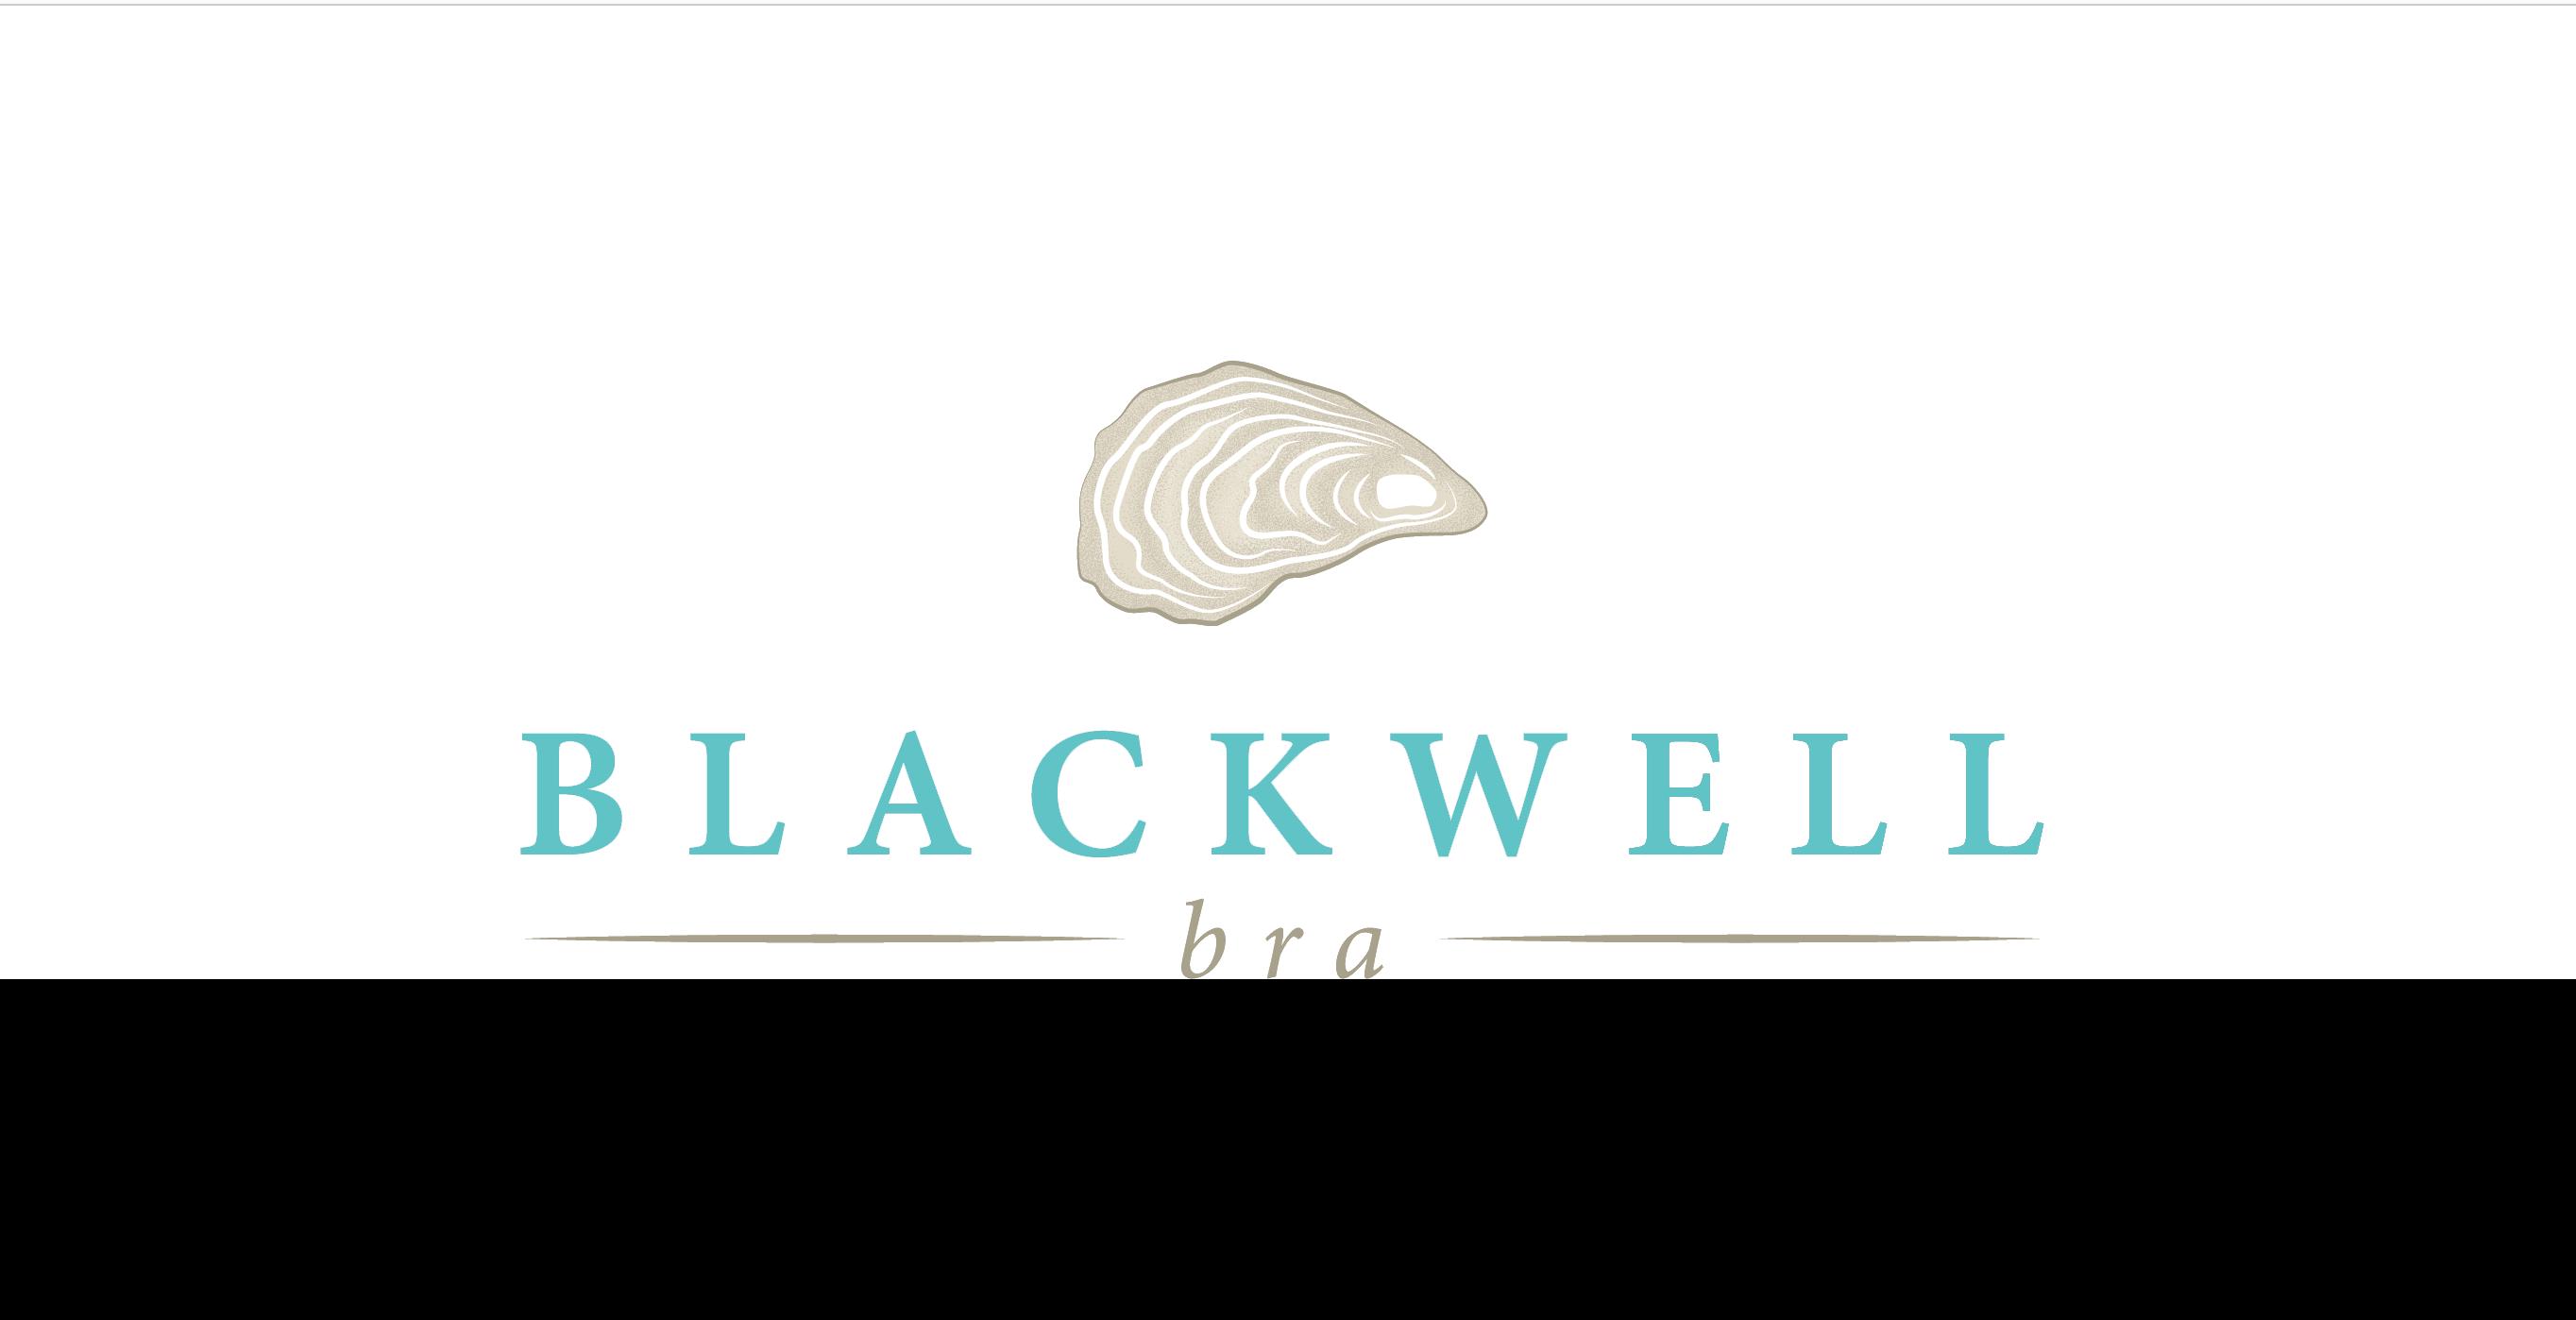 The Blackwell Bra